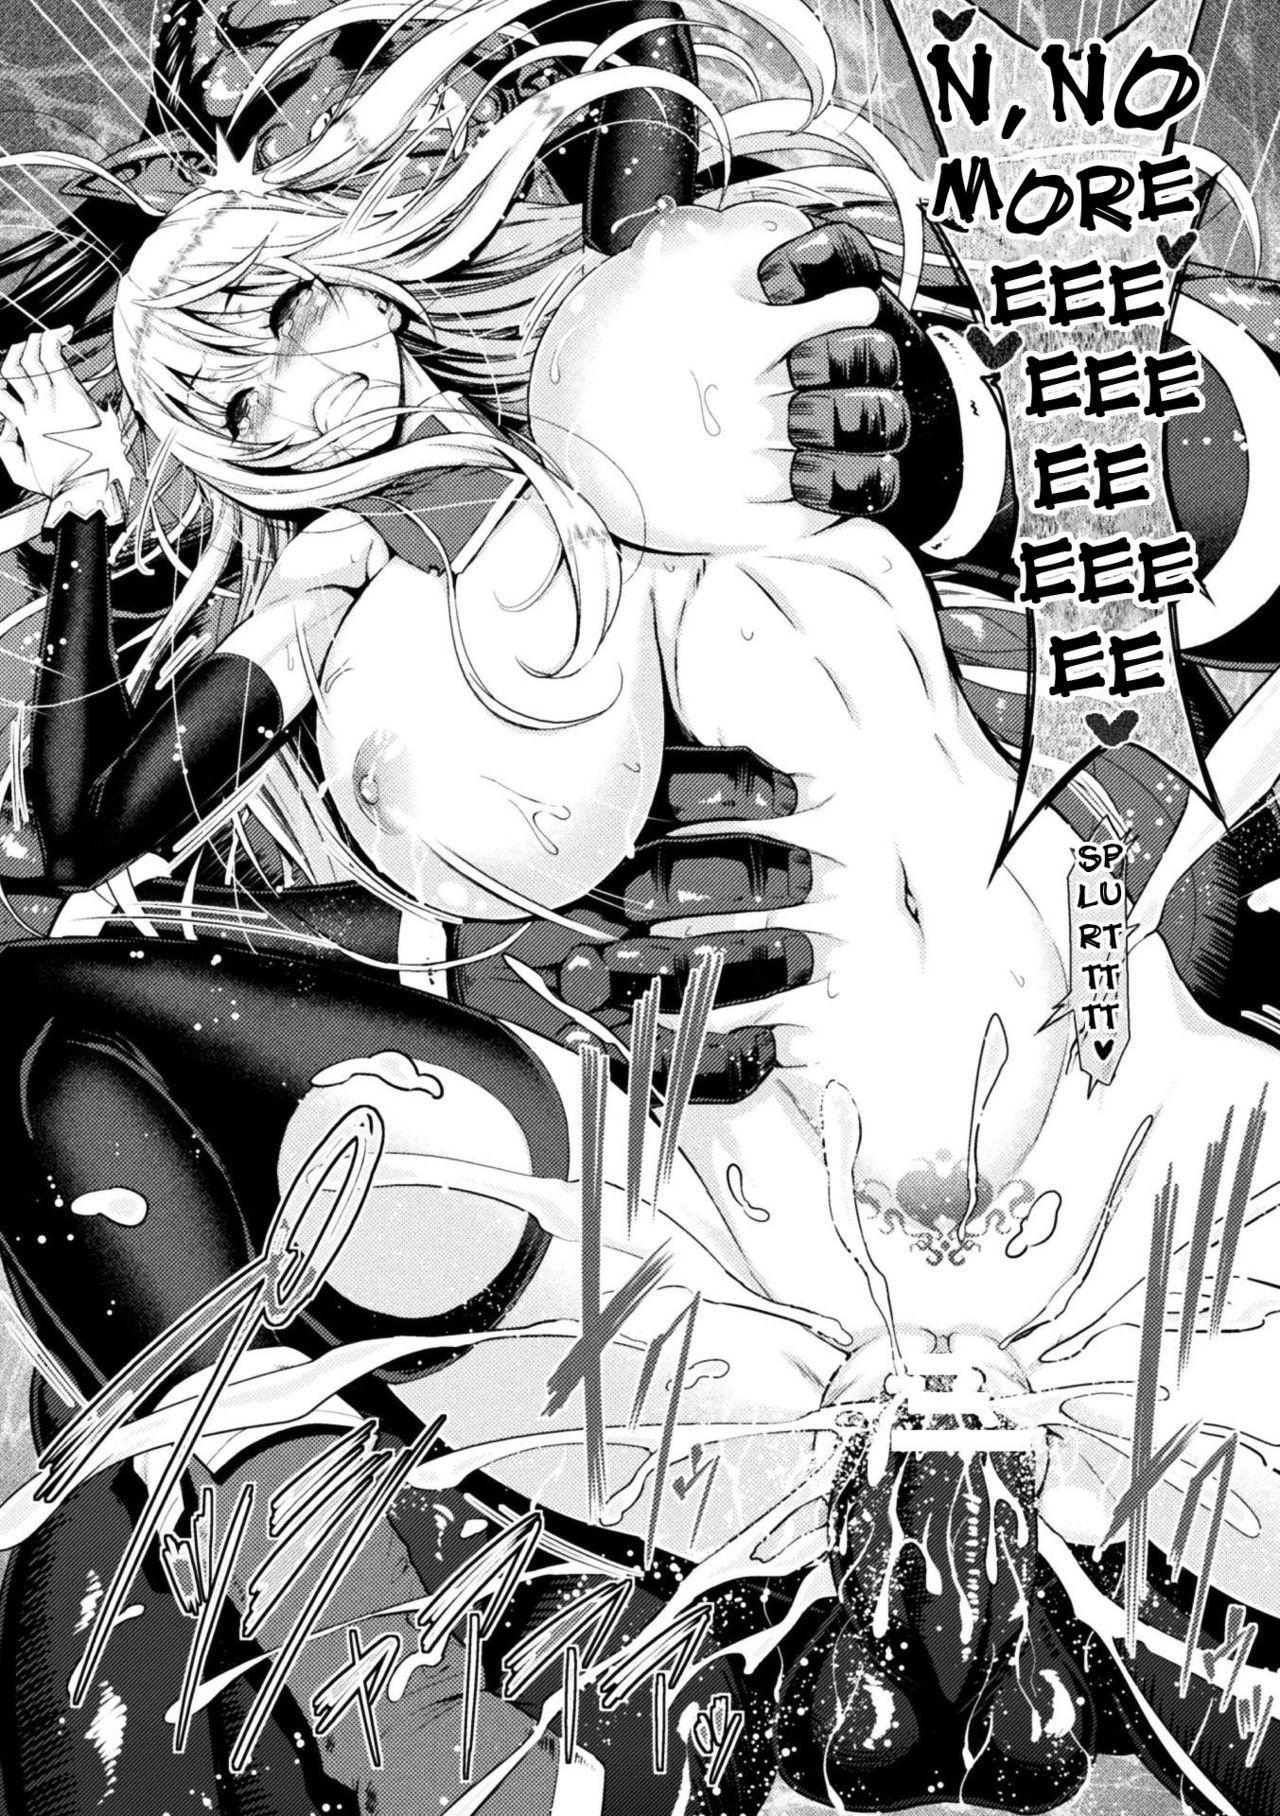 [Yamada Gogogo] Erona ~Orc no Inmon ni Okasareta Onna Kishi no Matsuro~ | Erona ~The Fall of a Beautiful Knight Cursed with the Lewd Mark of an Orc~ [English] {darknight} 46